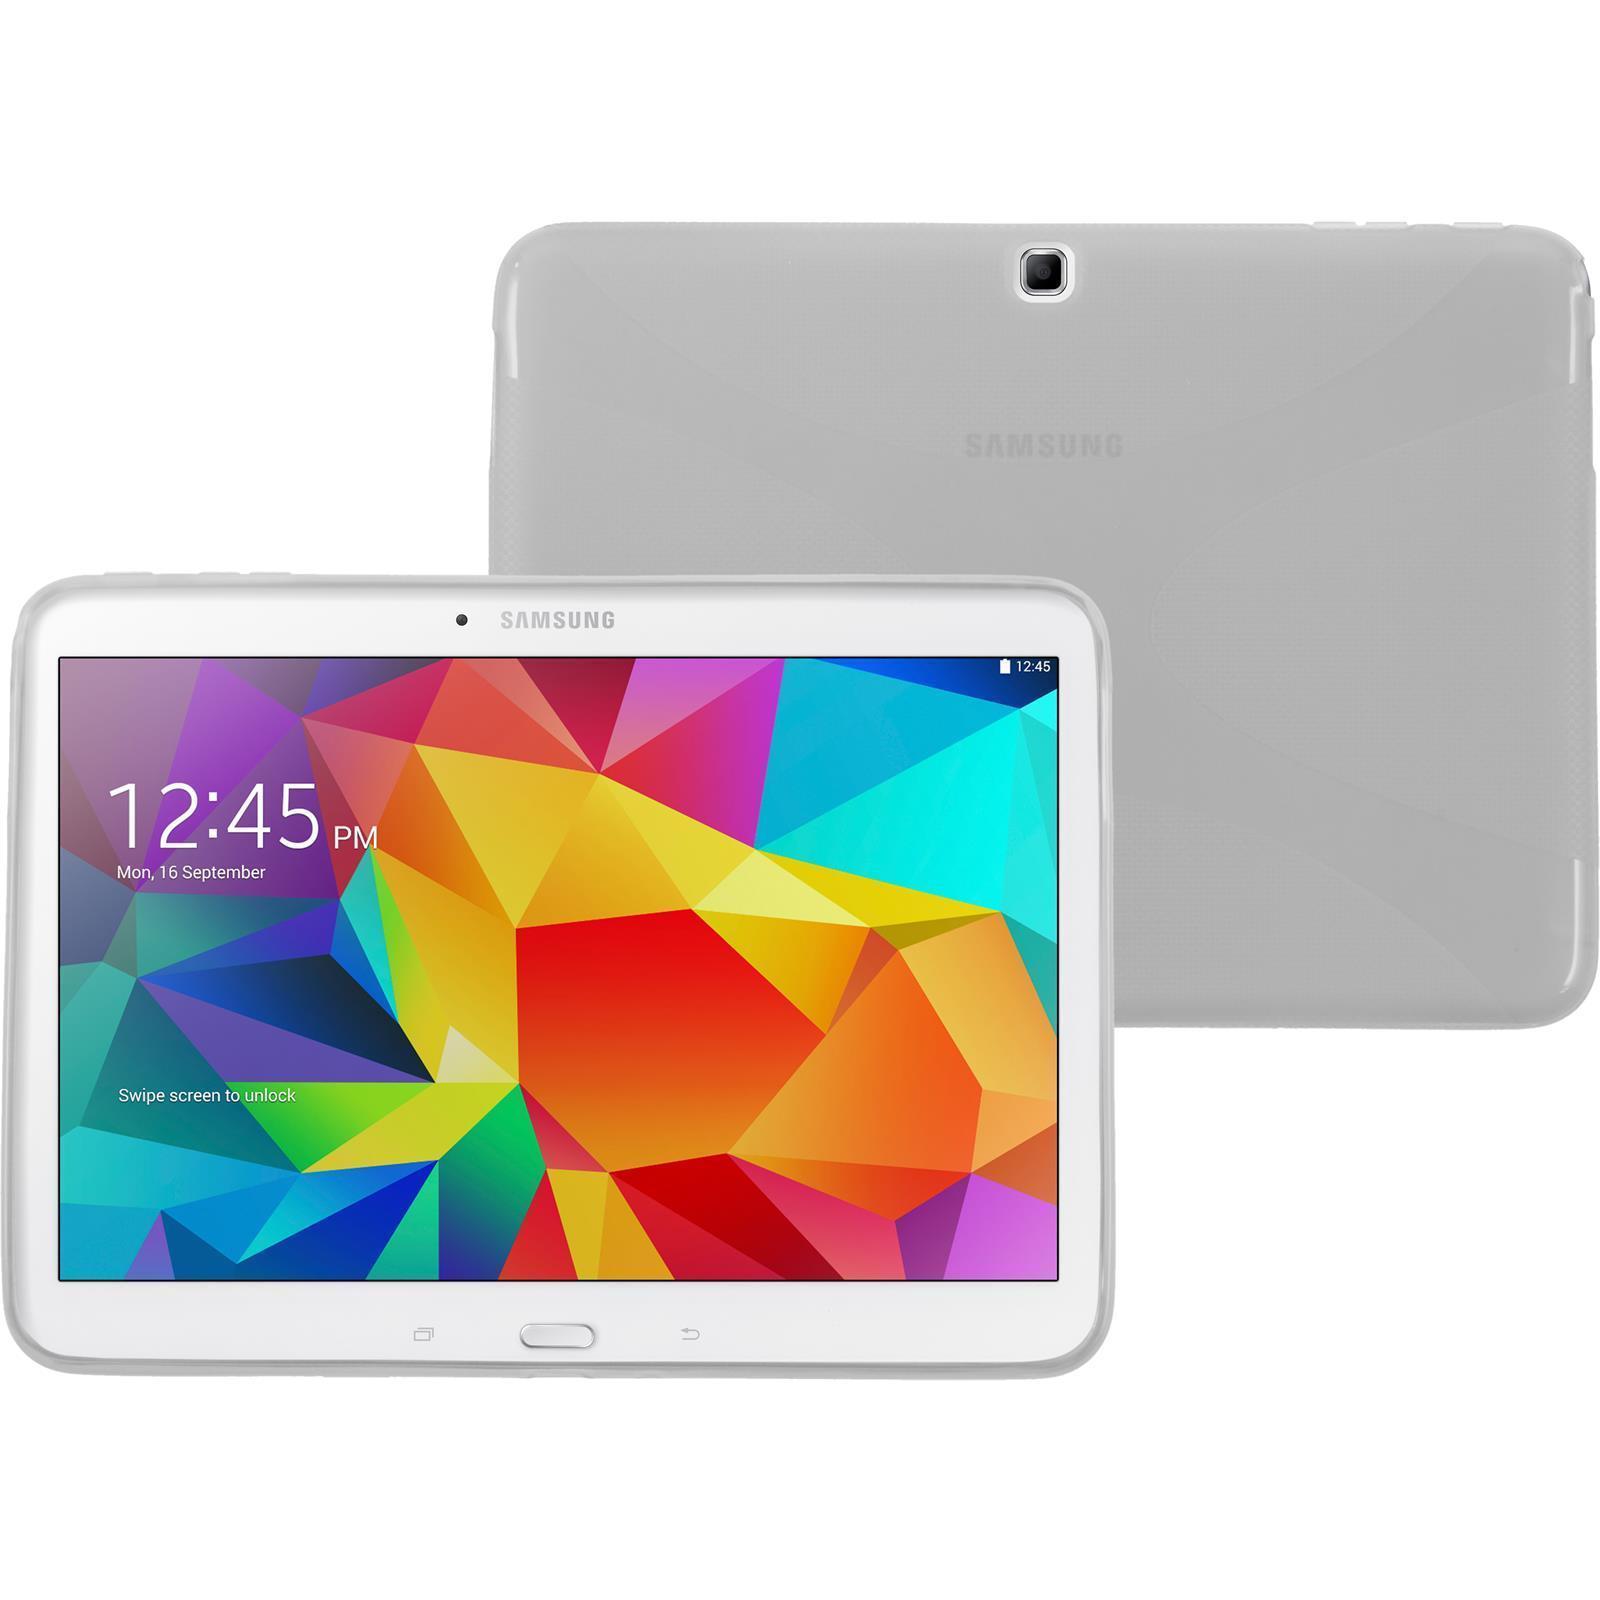 Pouzdro GEL pro Samsung Galaxy Tab 4 10.1 T530 světlé